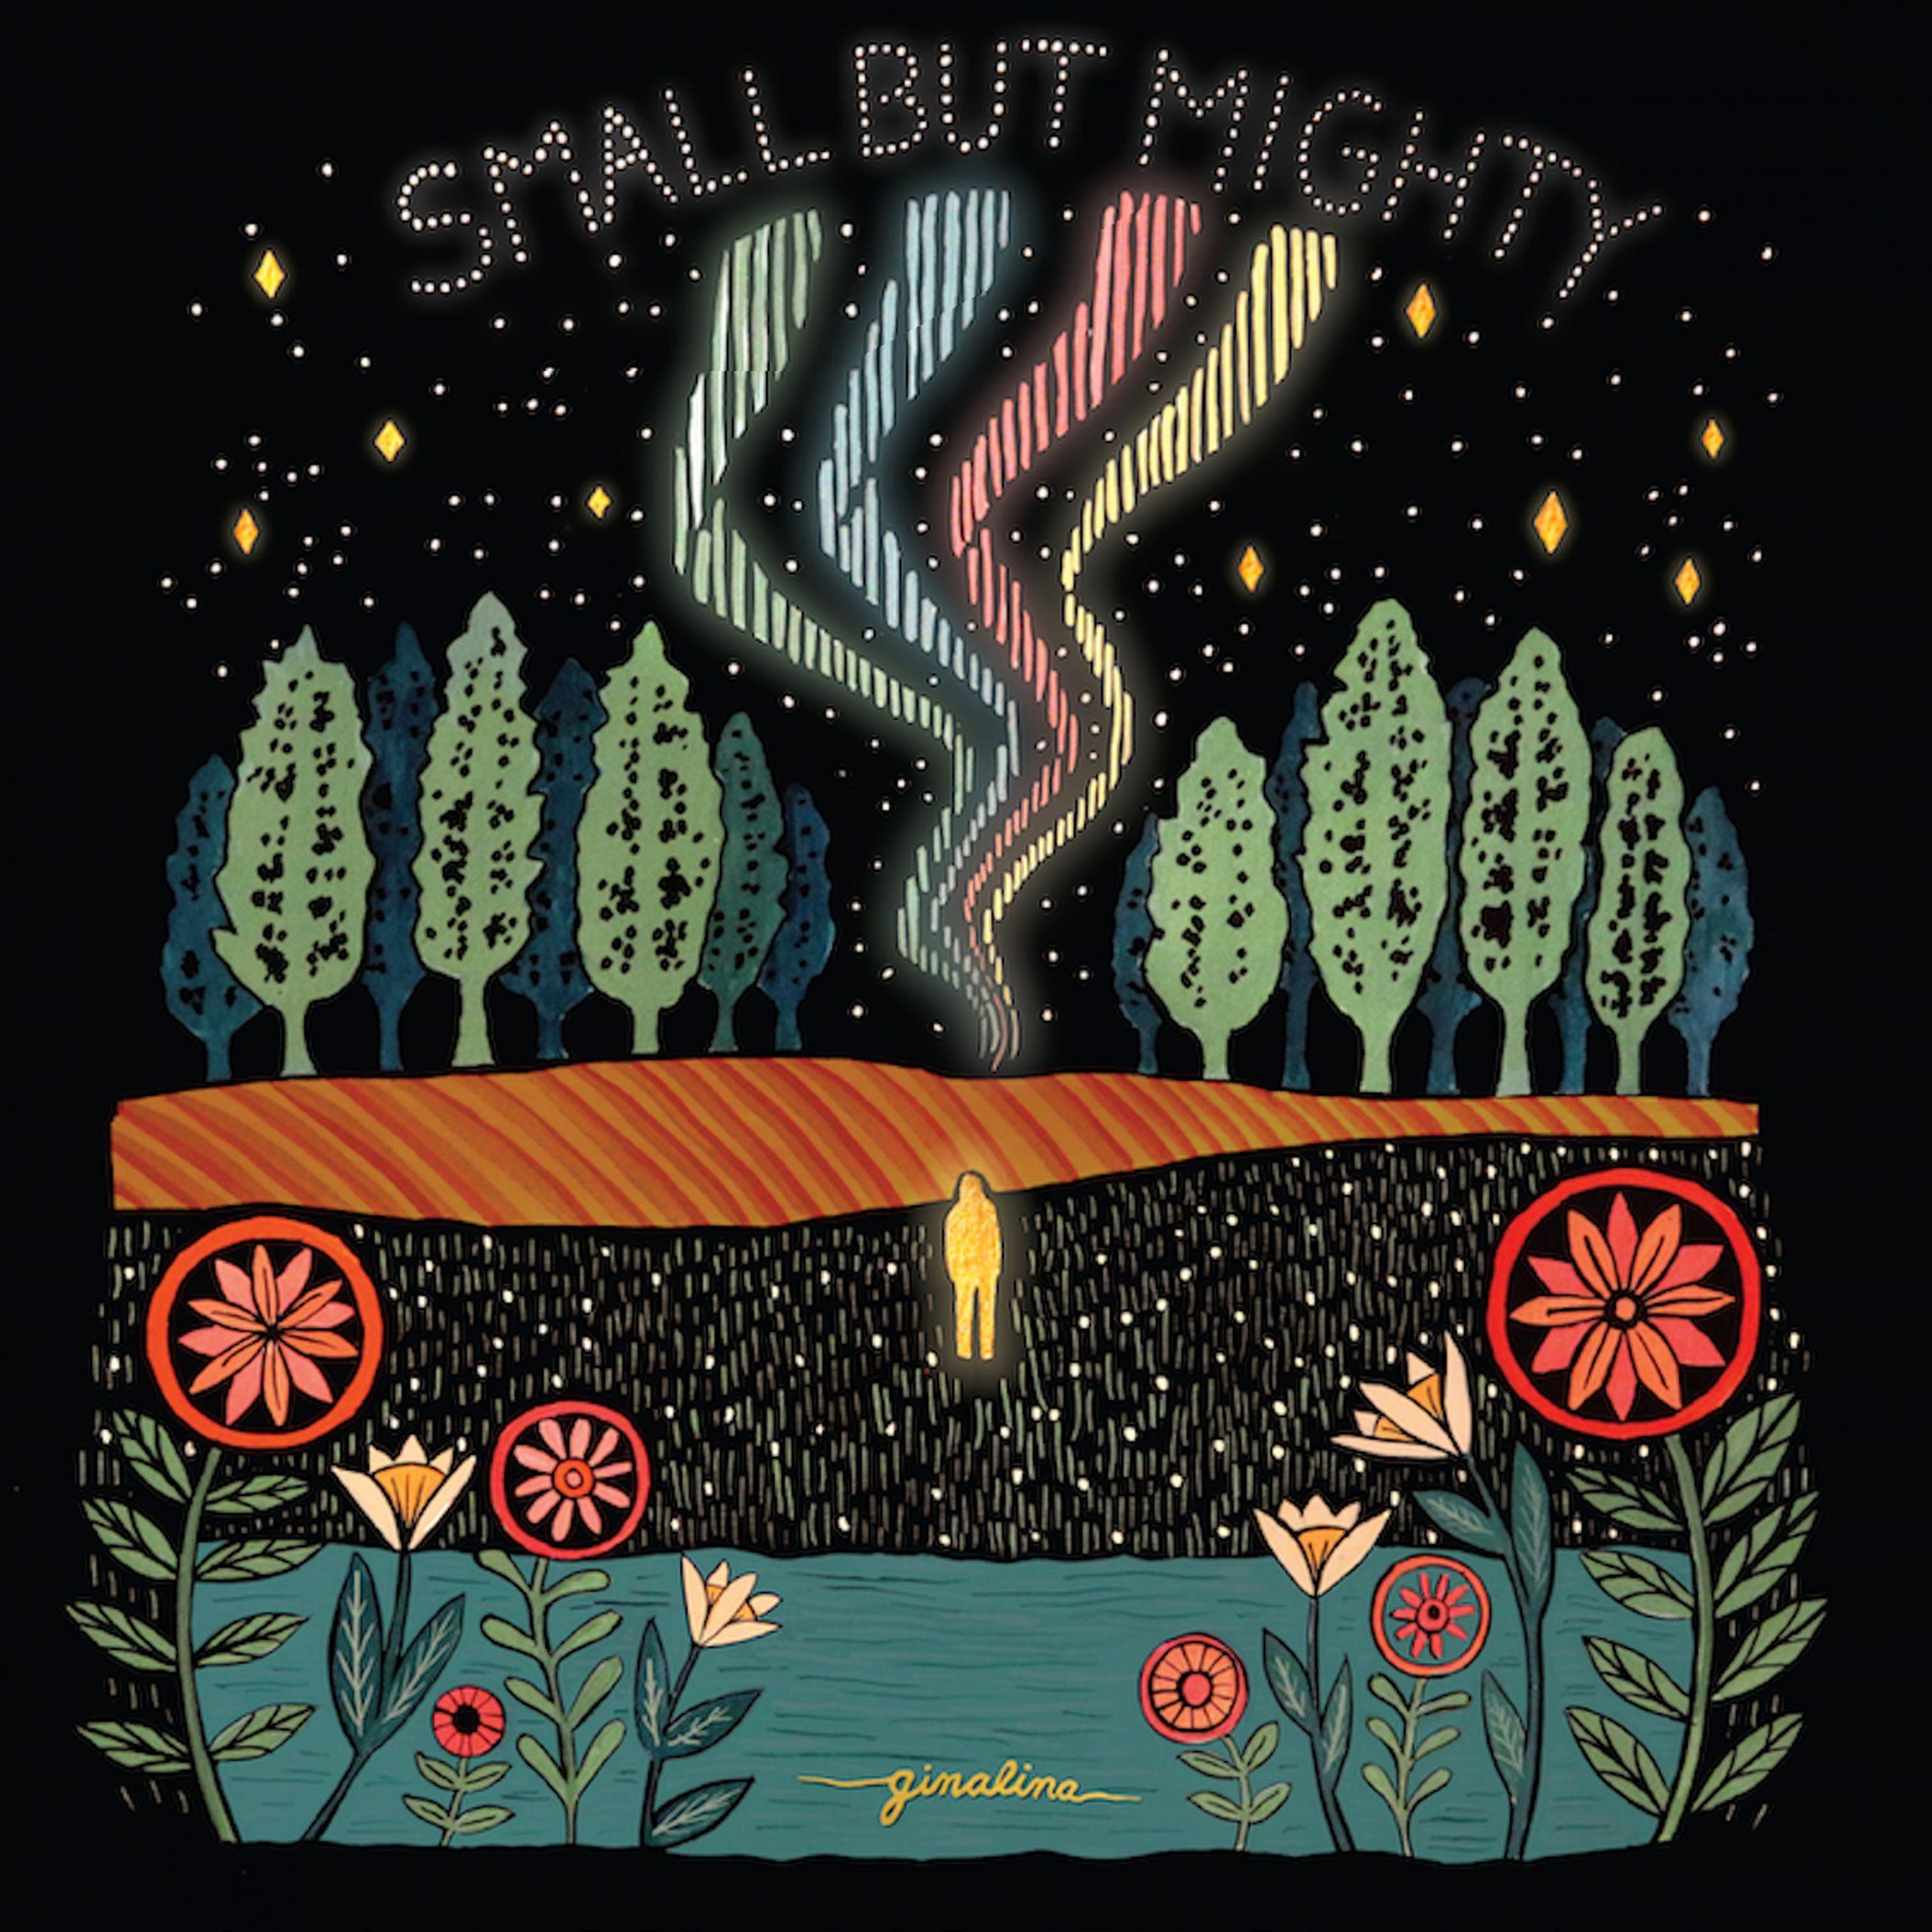 Small But Mighty, by Ginalina